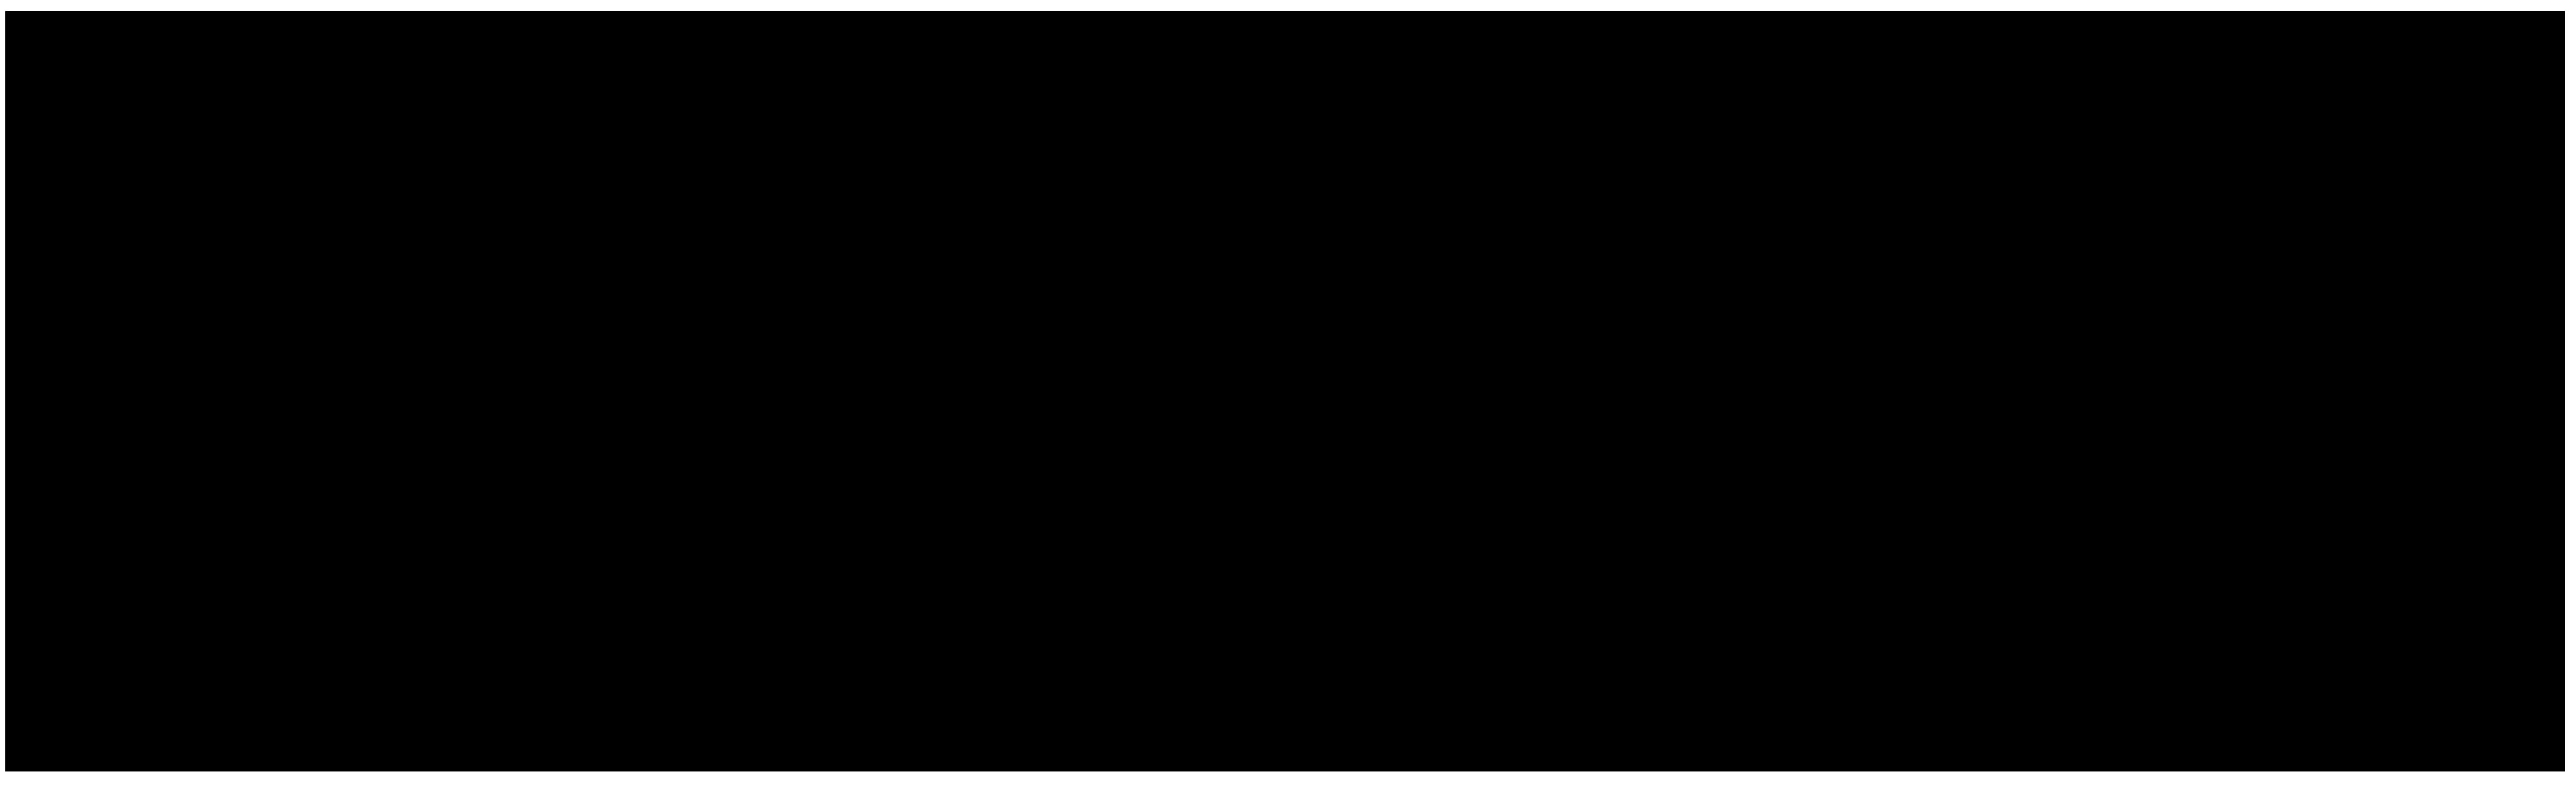 Corcoran Group logo